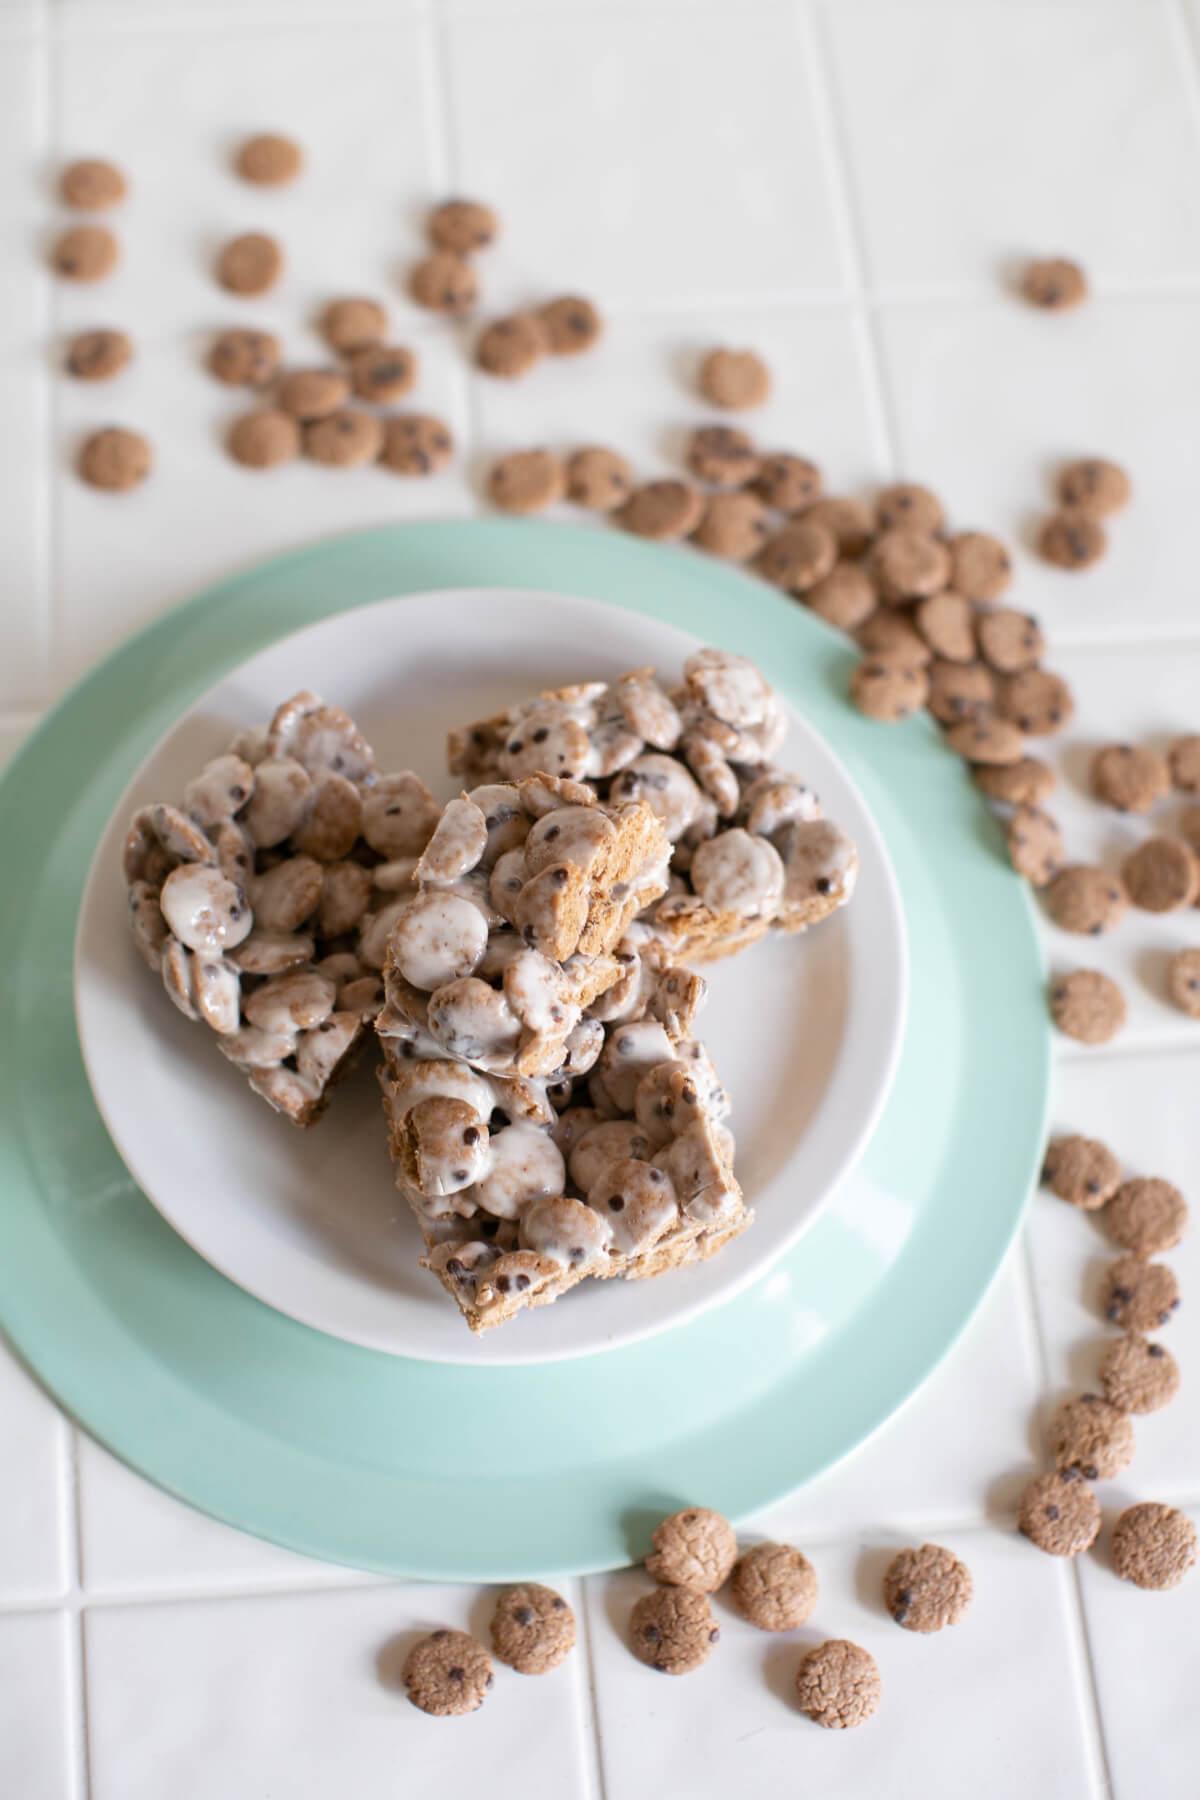 plated cookie crisp marshmallow treats recipes